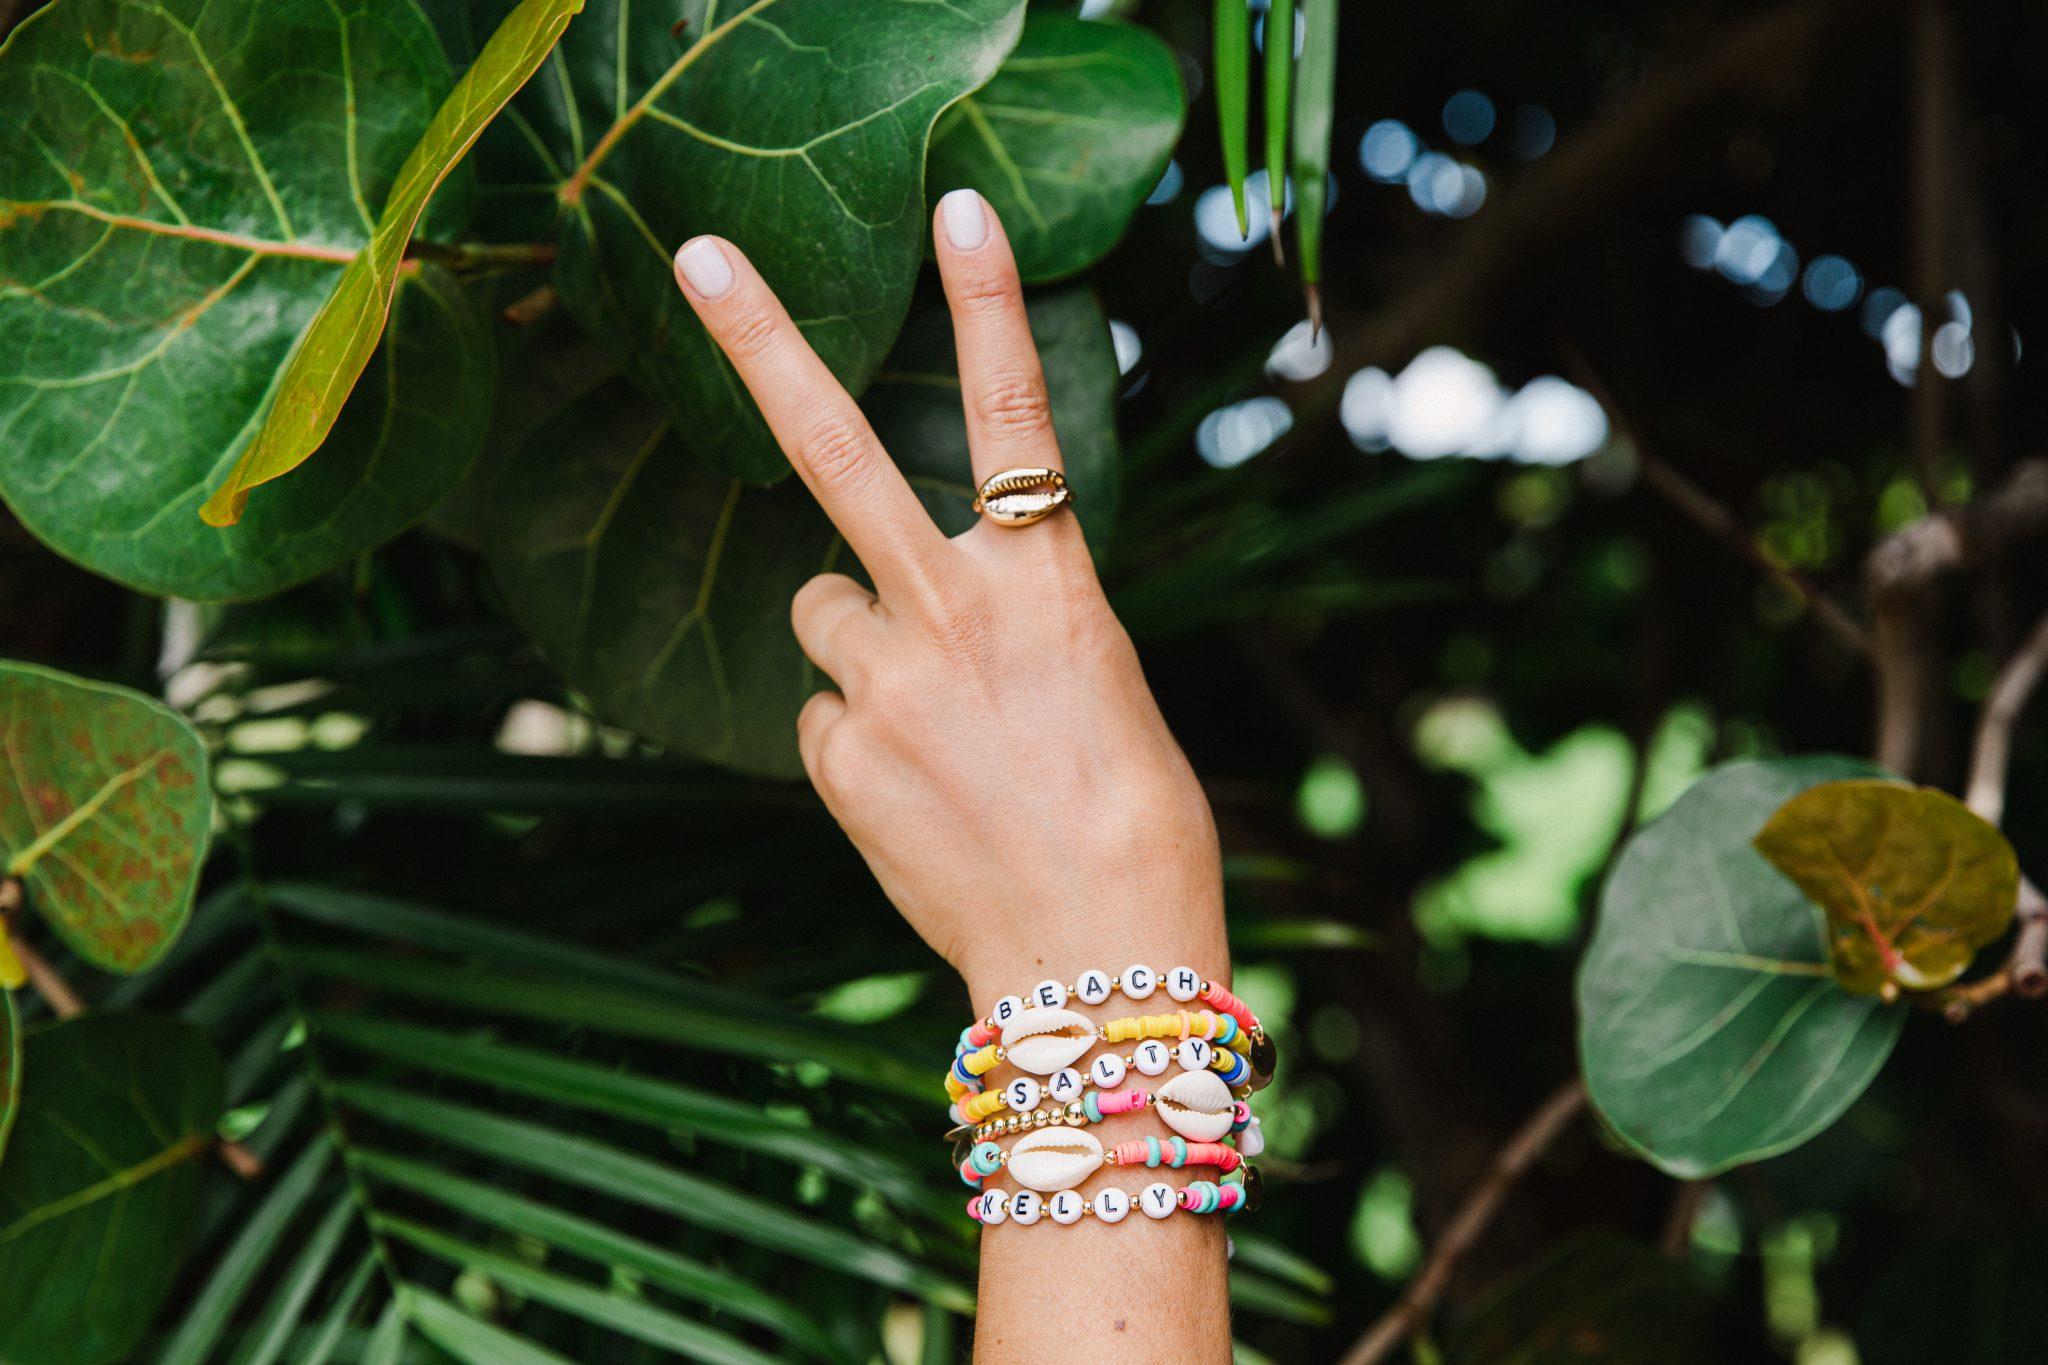 taudrey-x-kelly-saks-playa-collection-bracelets